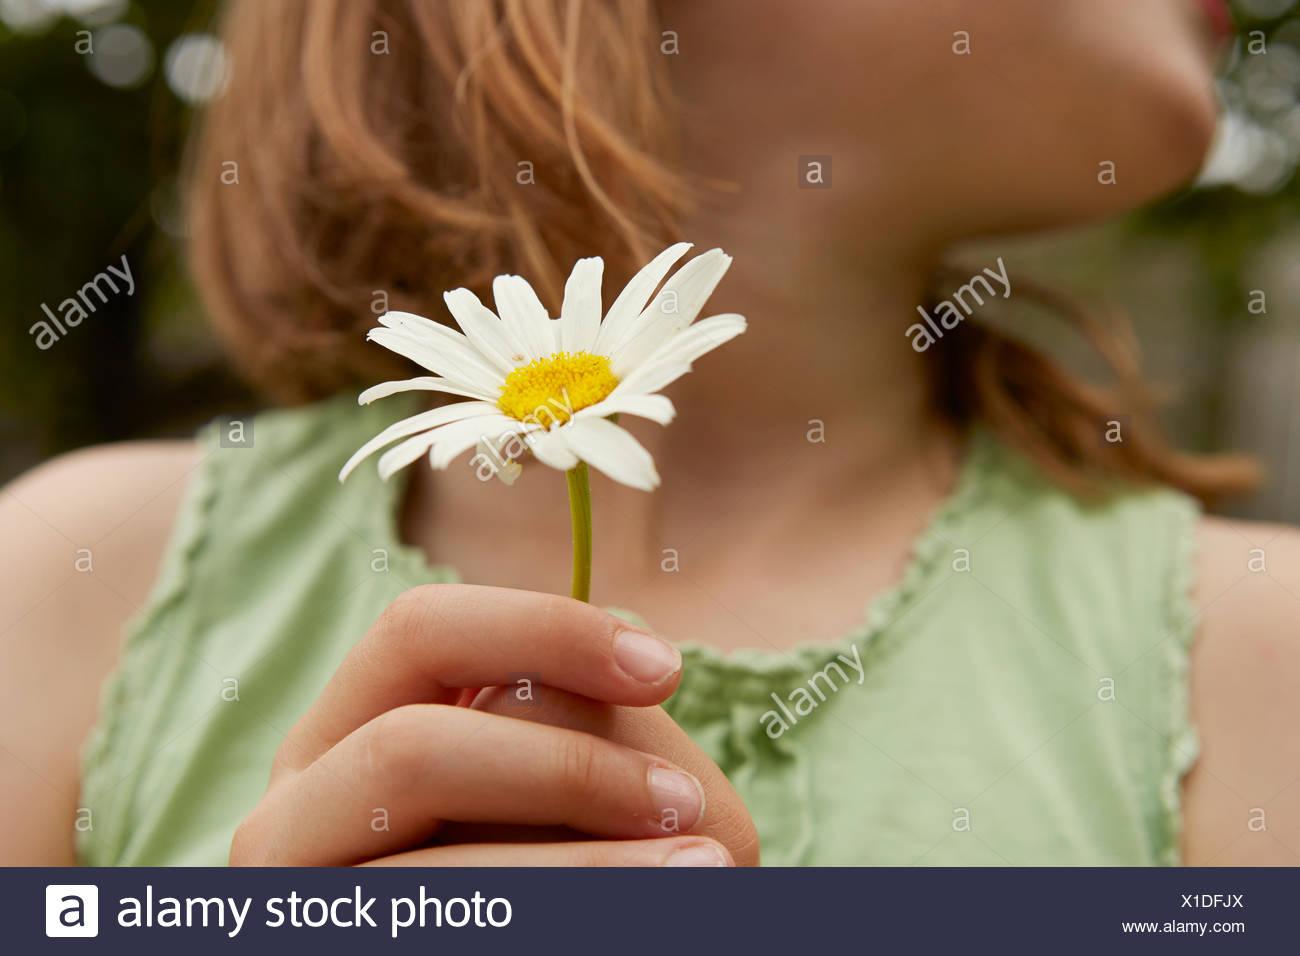 Cropped Image Of Girl Holding Daisy Flower Stock Photo 276278210